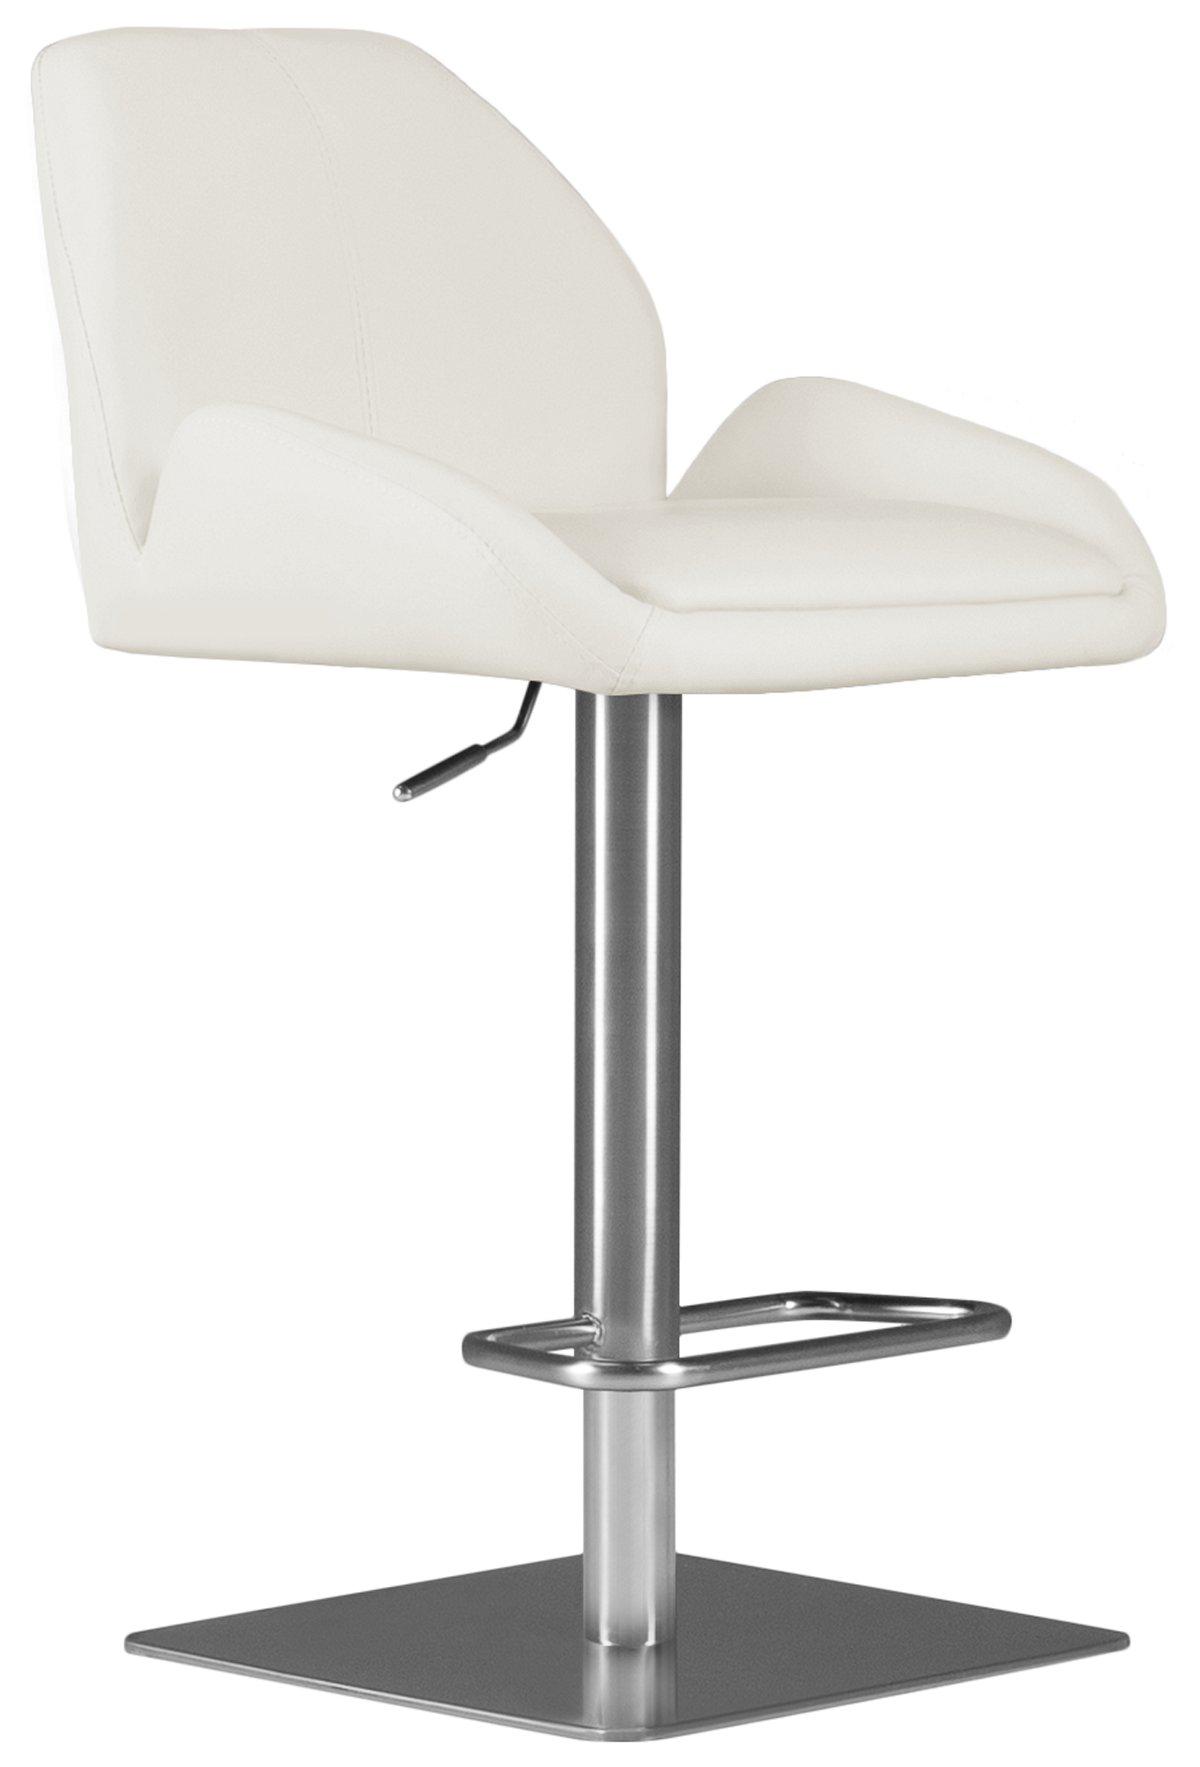 Fairfax White Upholstered Adjustable Stool